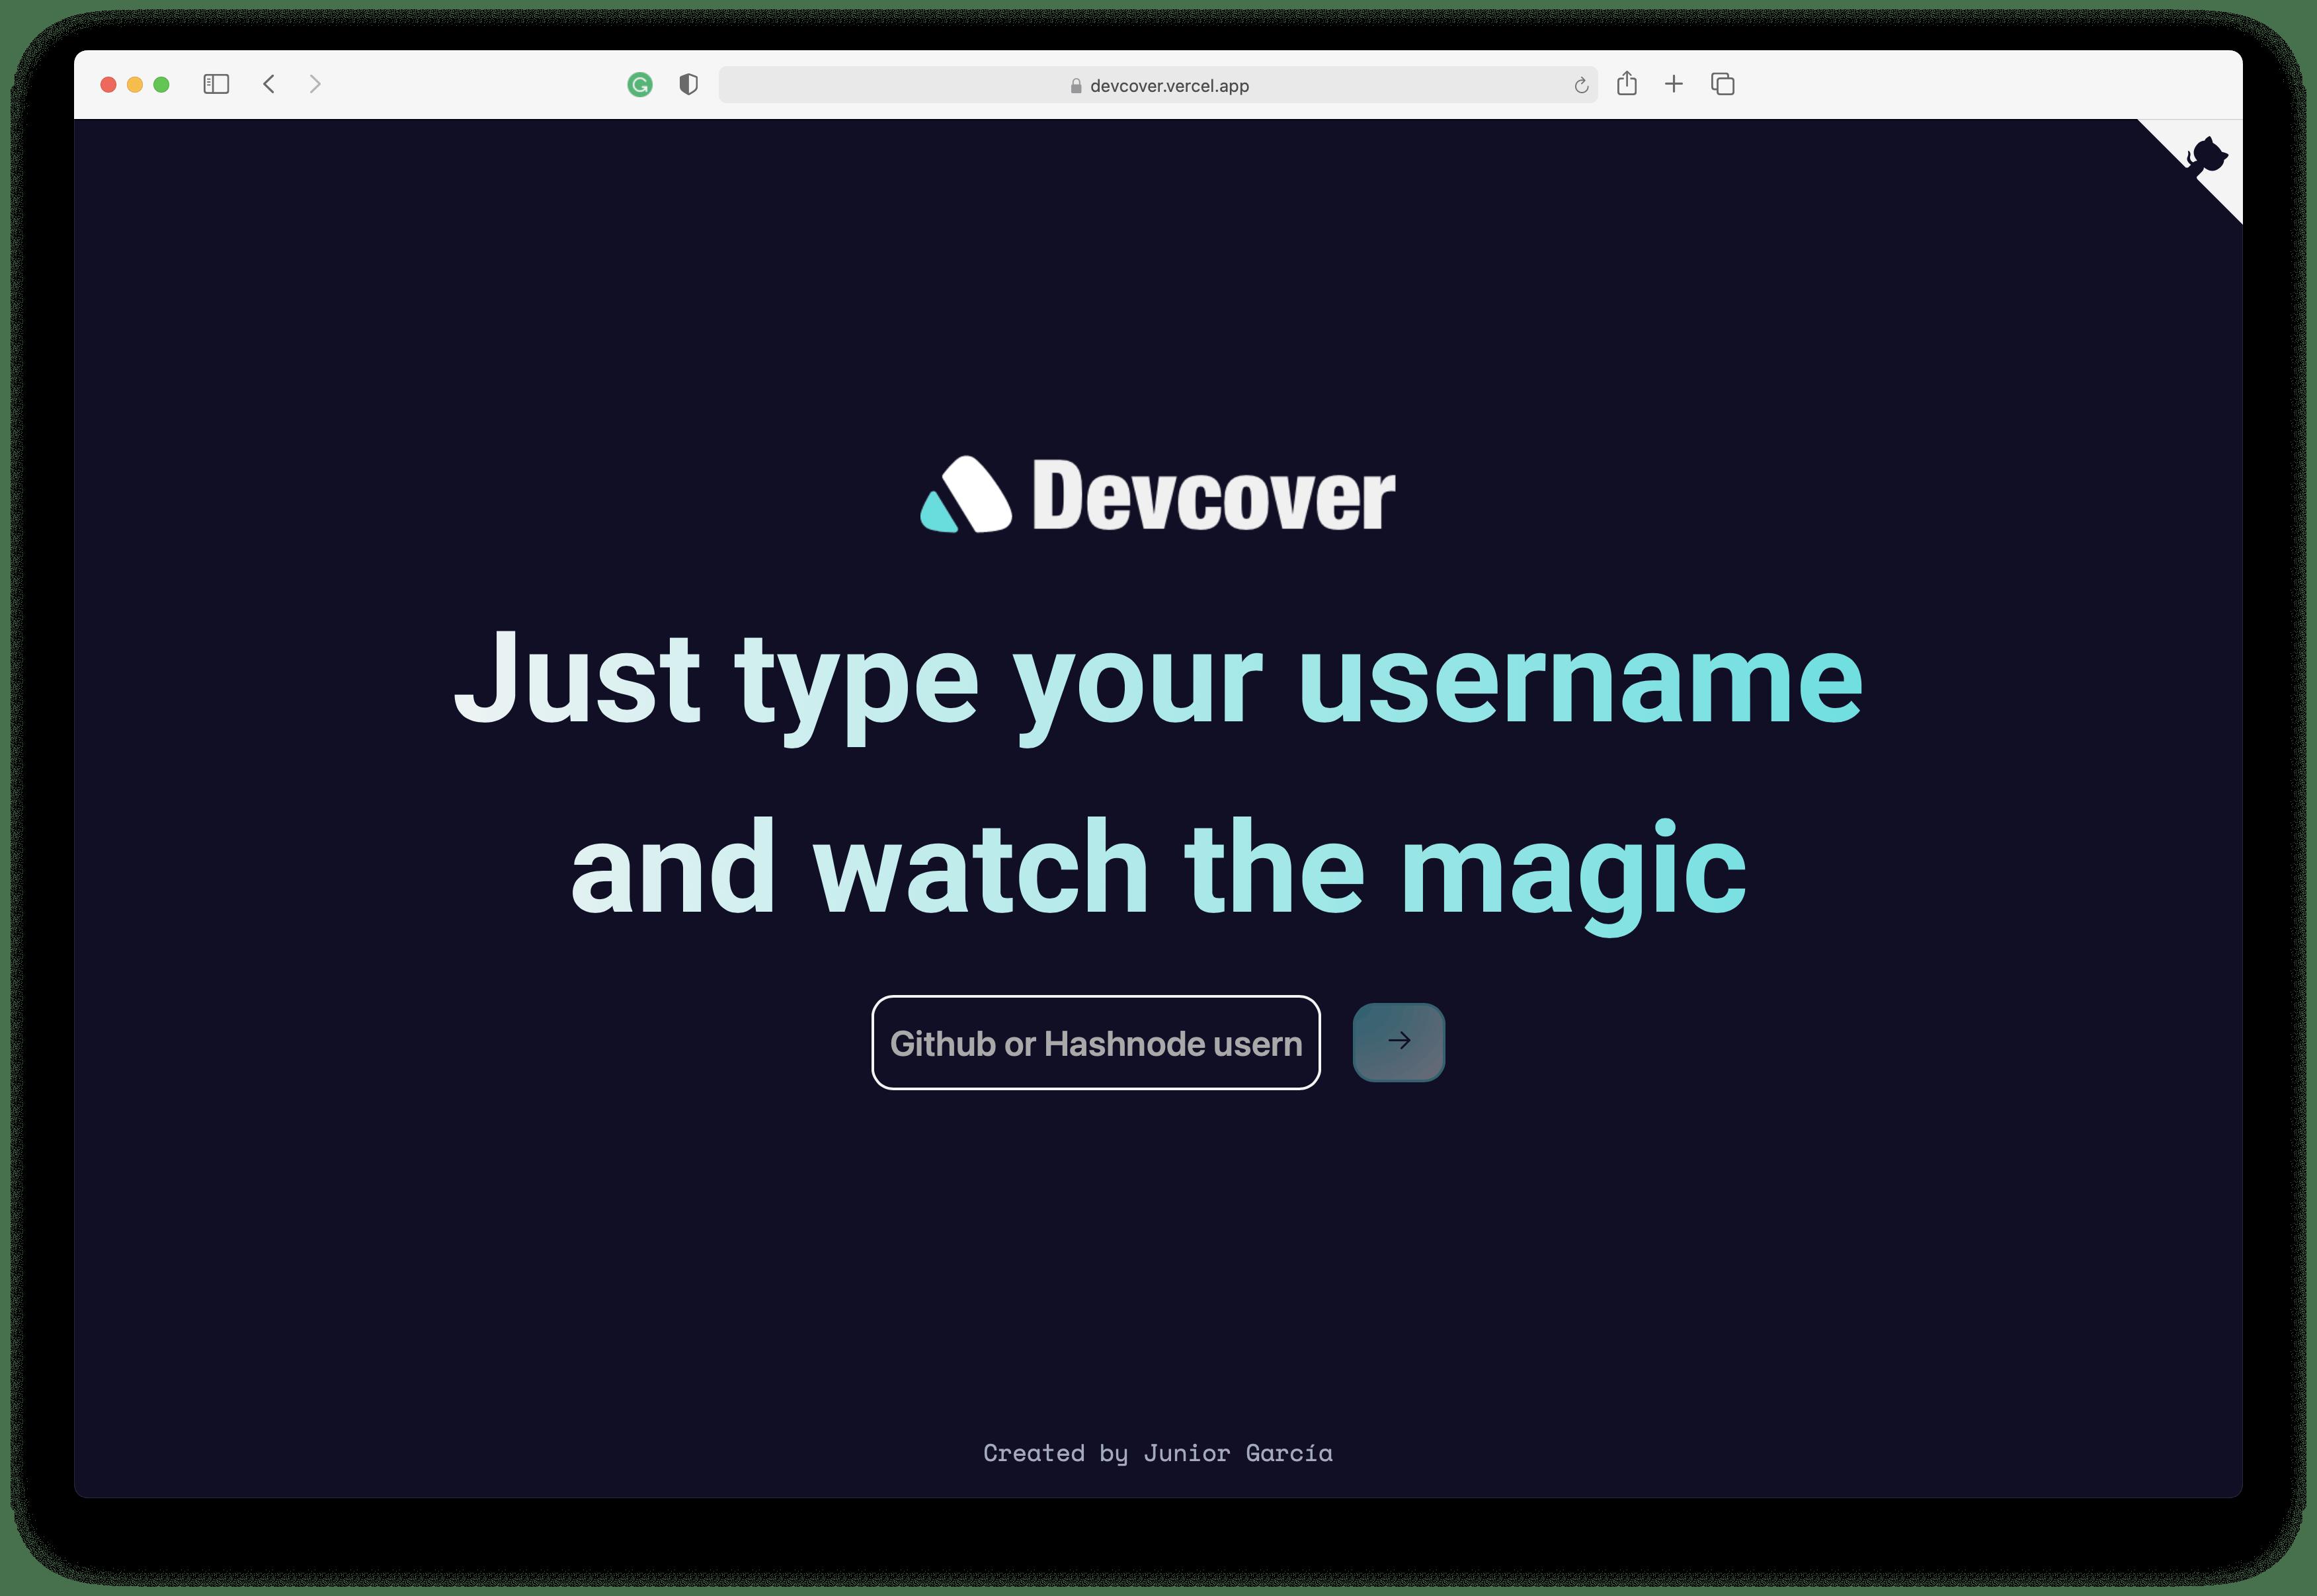 Devcover